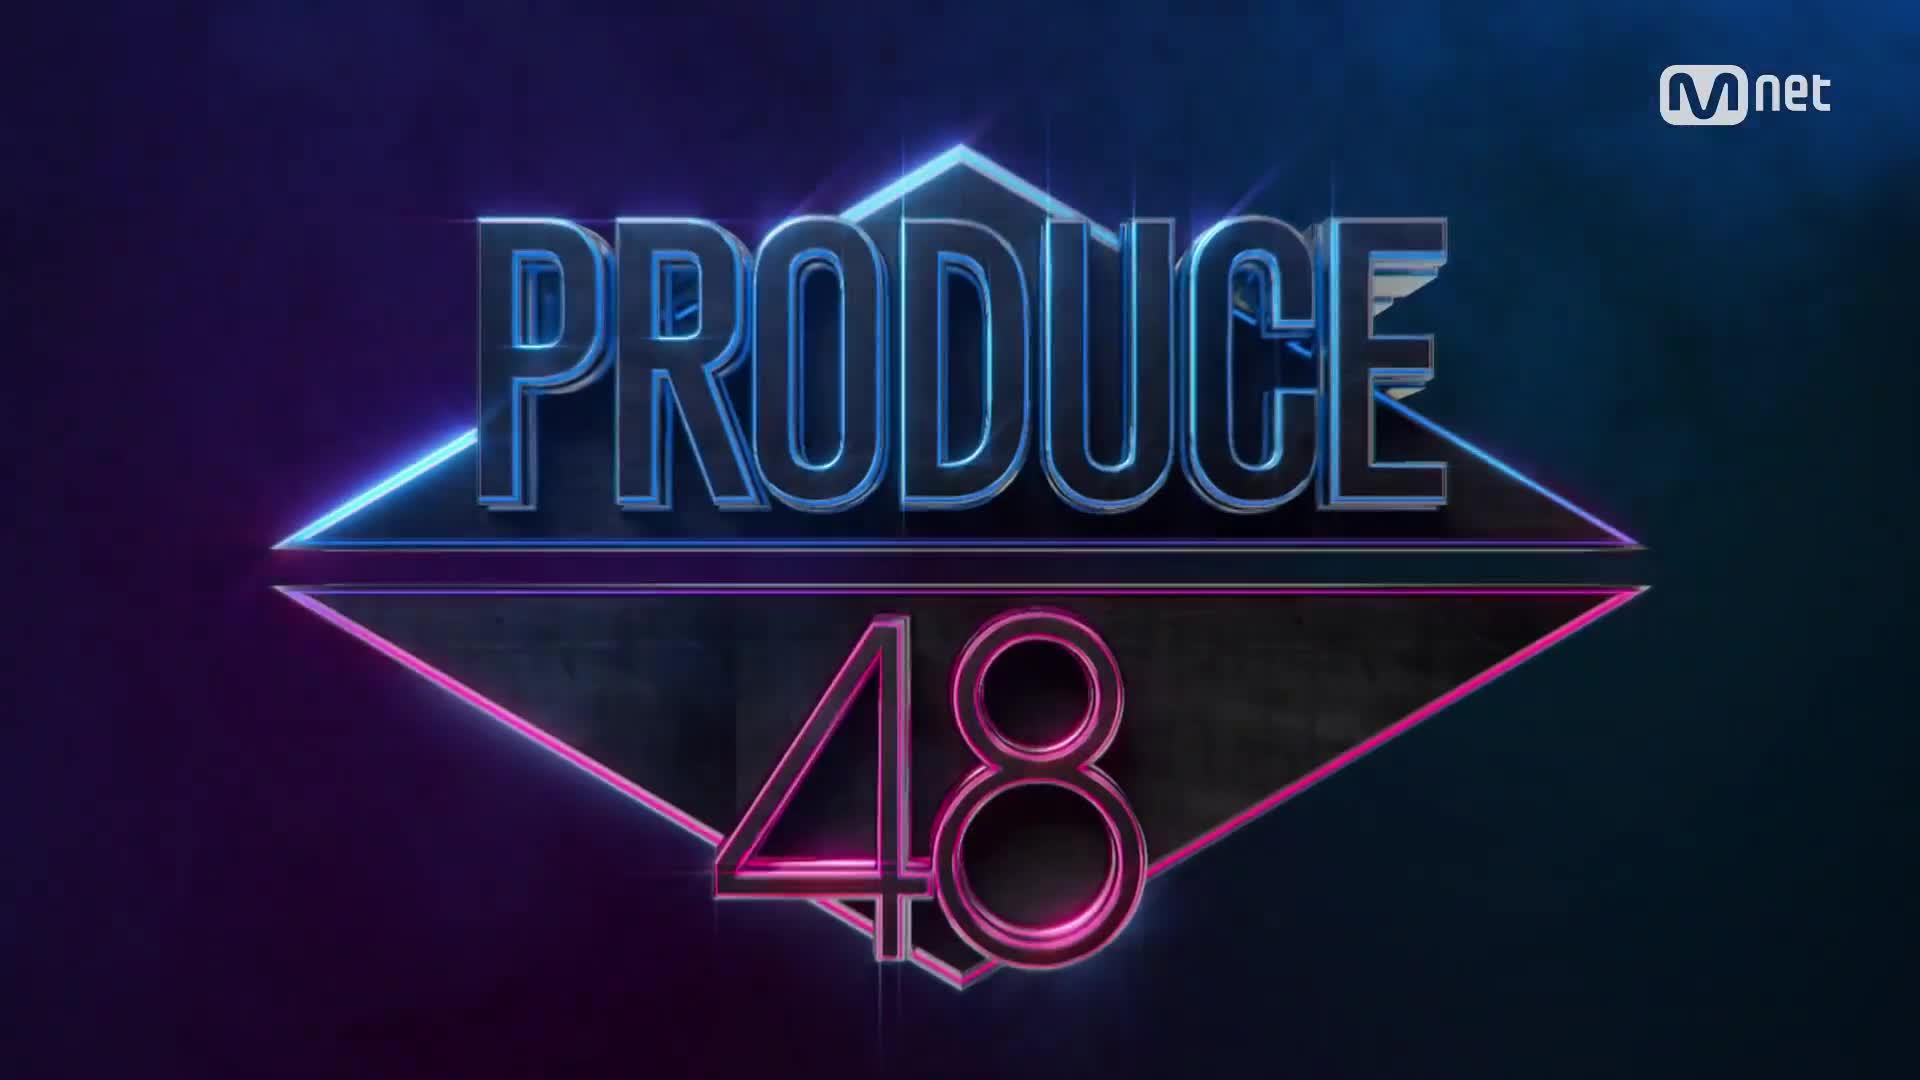 Mnet, Produce101, Produce48, 프로듀스101, 프로듀스48, Produce 101 PRODUCE 48 = PRODUCE101 + AKB48 171129 EP.22 GIFs